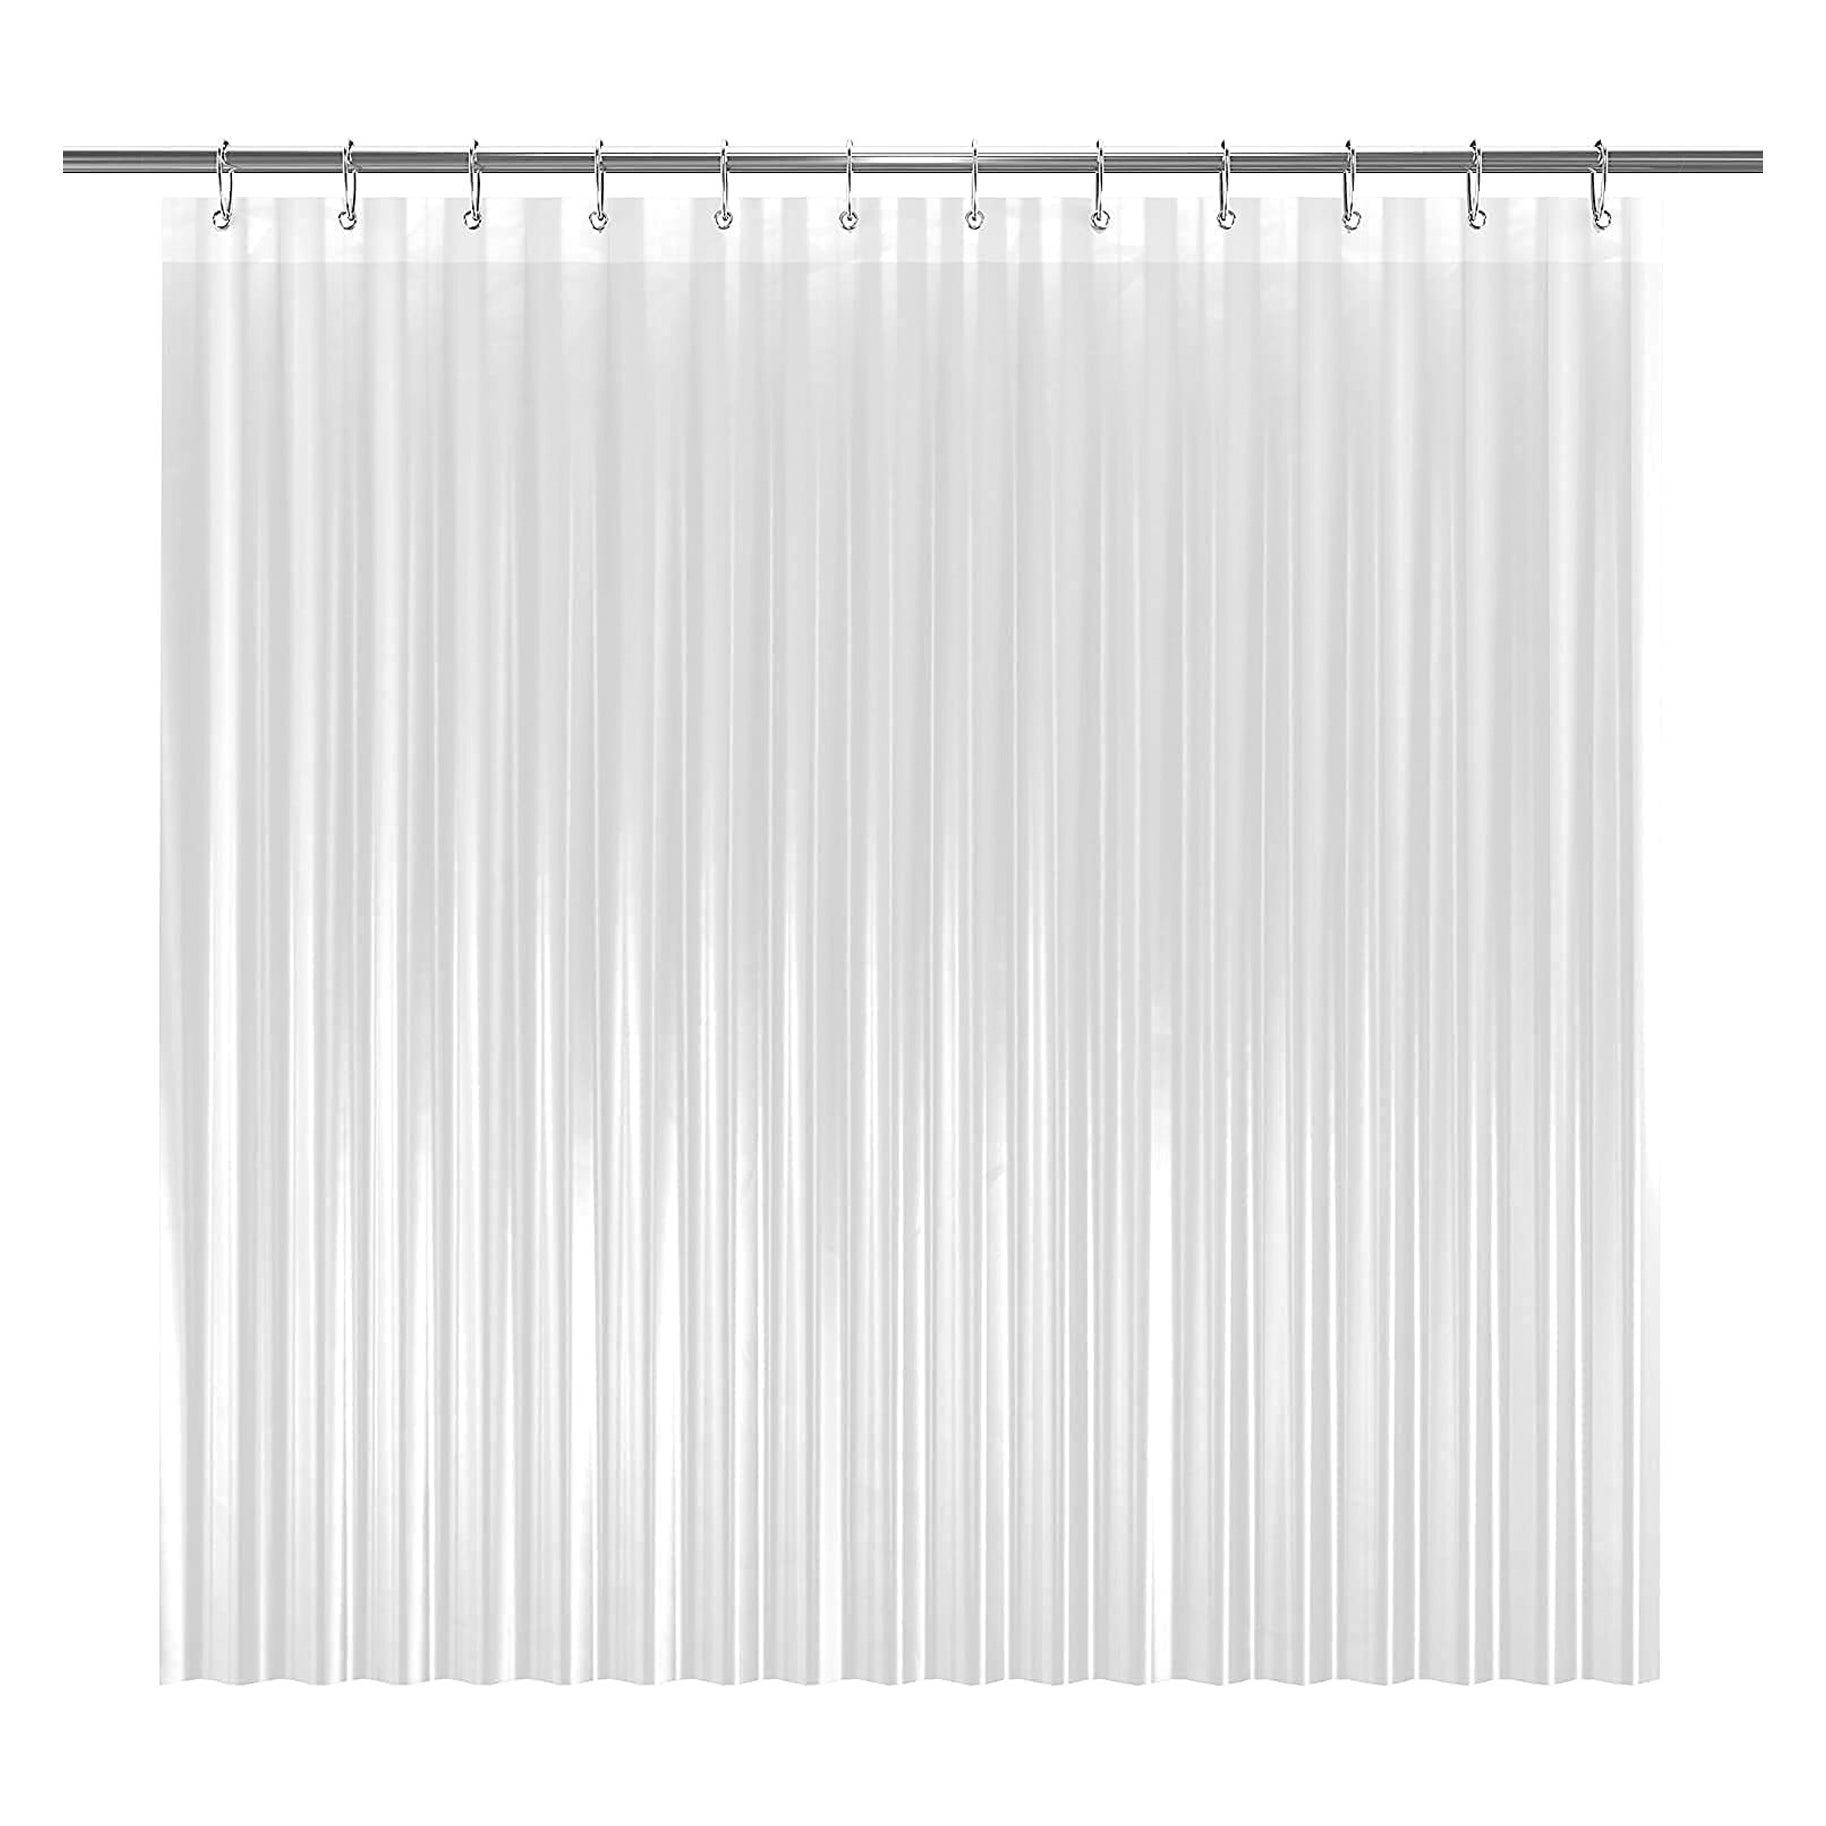 The-Best-Shower-Curtains-Option-LiBa-Bathroom-Shower-Curtain-Liner